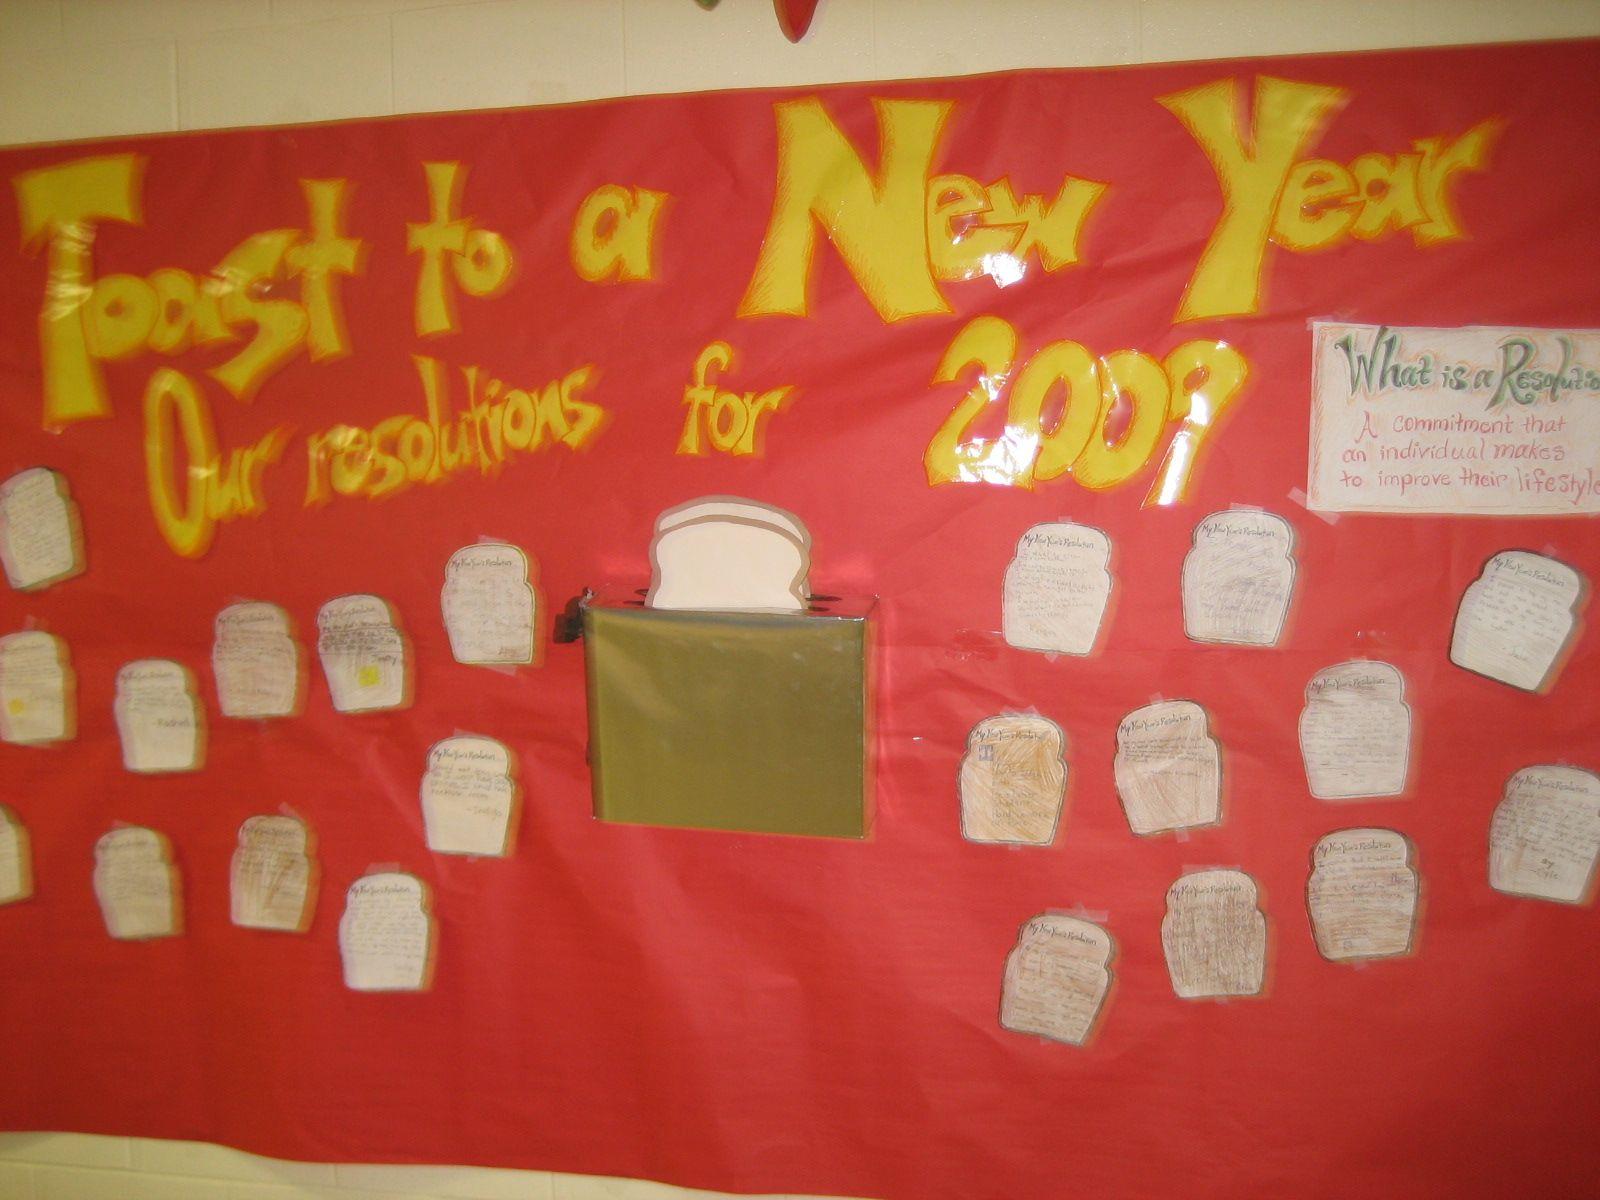 New Year Resolution Bulletin Board...instead champan